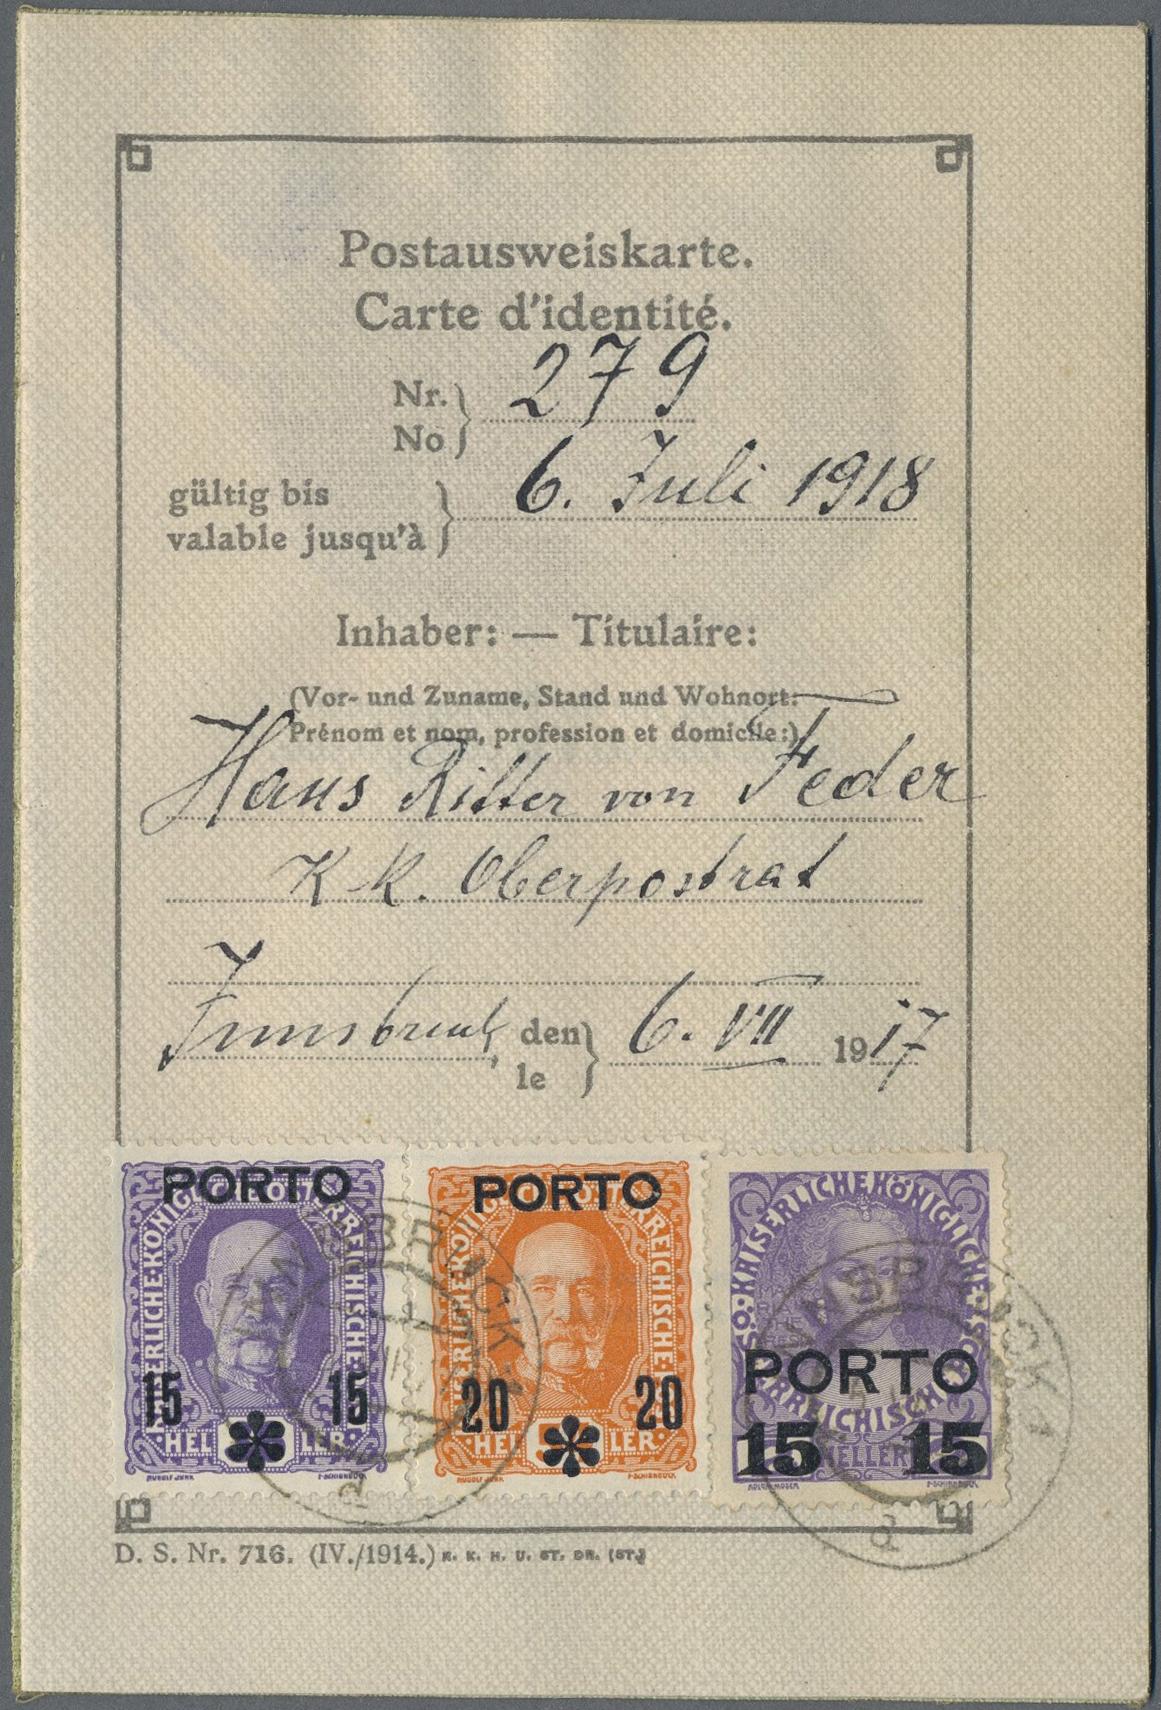 Lot 18125 - Österreich - Portomarken  -  Auktionshaus Christoph Gärtner GmbH & Co. KG Single lots Philately Overseas & Europe. Auction #39 Day 4